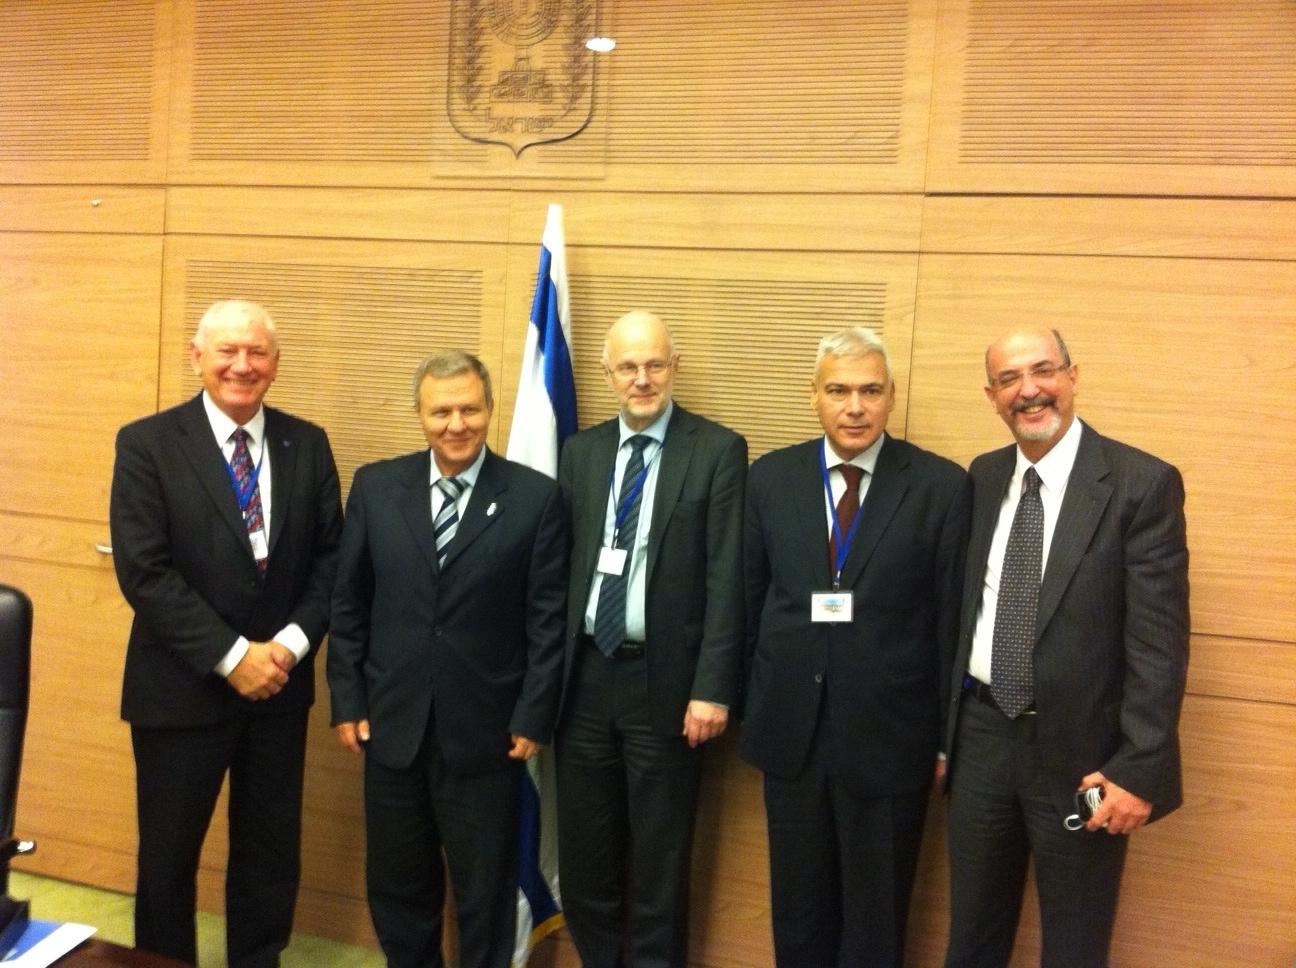 From left: Sandy Boyle, Meir Sheetrit, Staffan Nilsson, Dimitris Dimitriadis, Yehuda TALMON